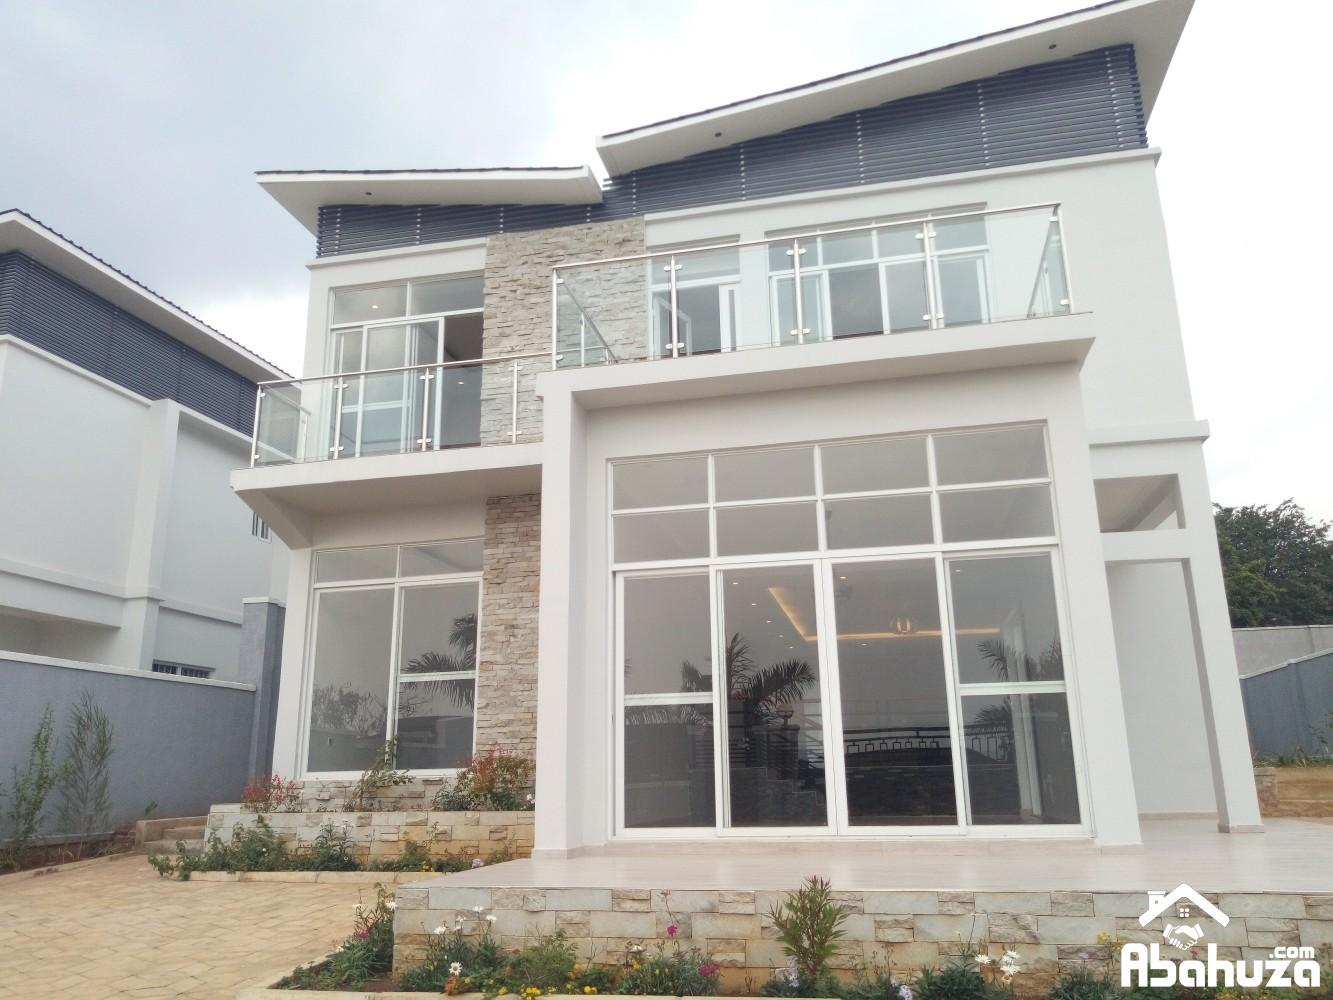 A BEAUTIFUL HOUSE IN HIGH CLASS NEIGHBORHOOD